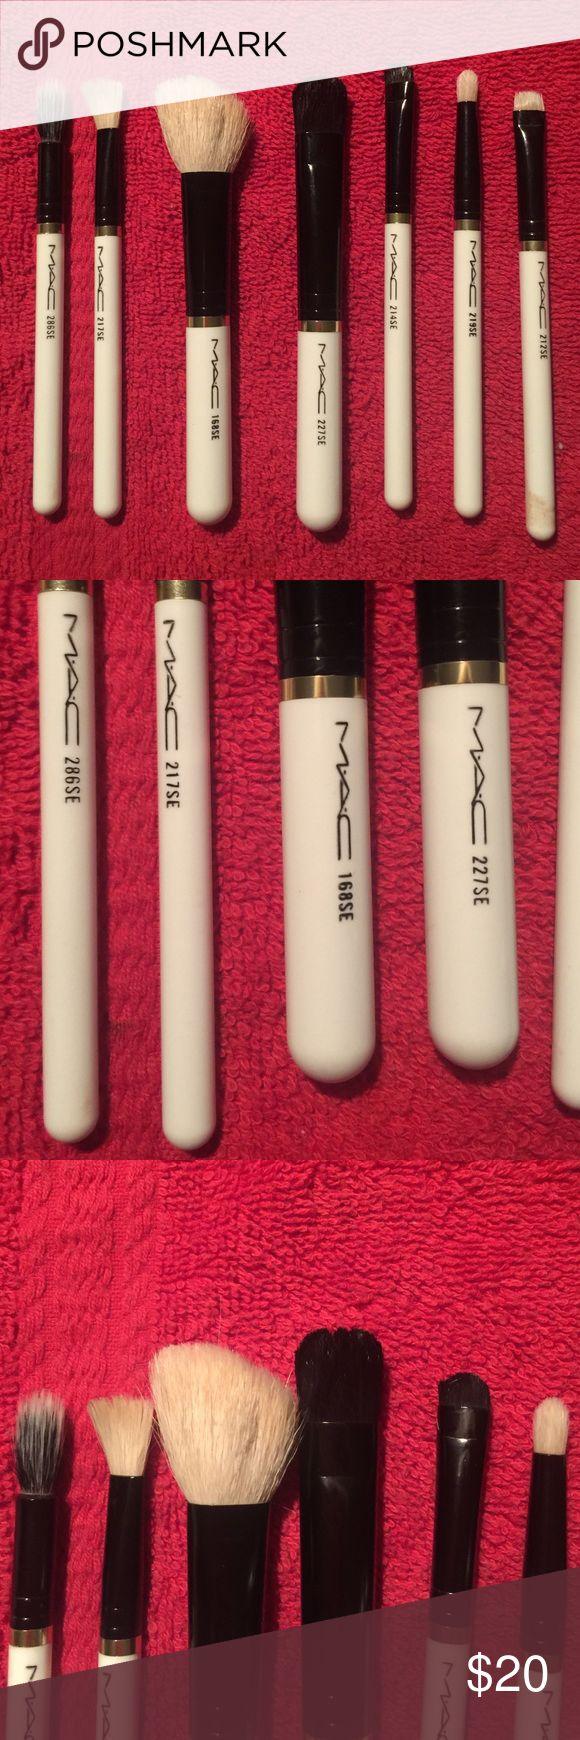 Mac 168 Large Angled Contour Brush: 1000+ Ideas About Mac Makeup Brushes On Pinterest